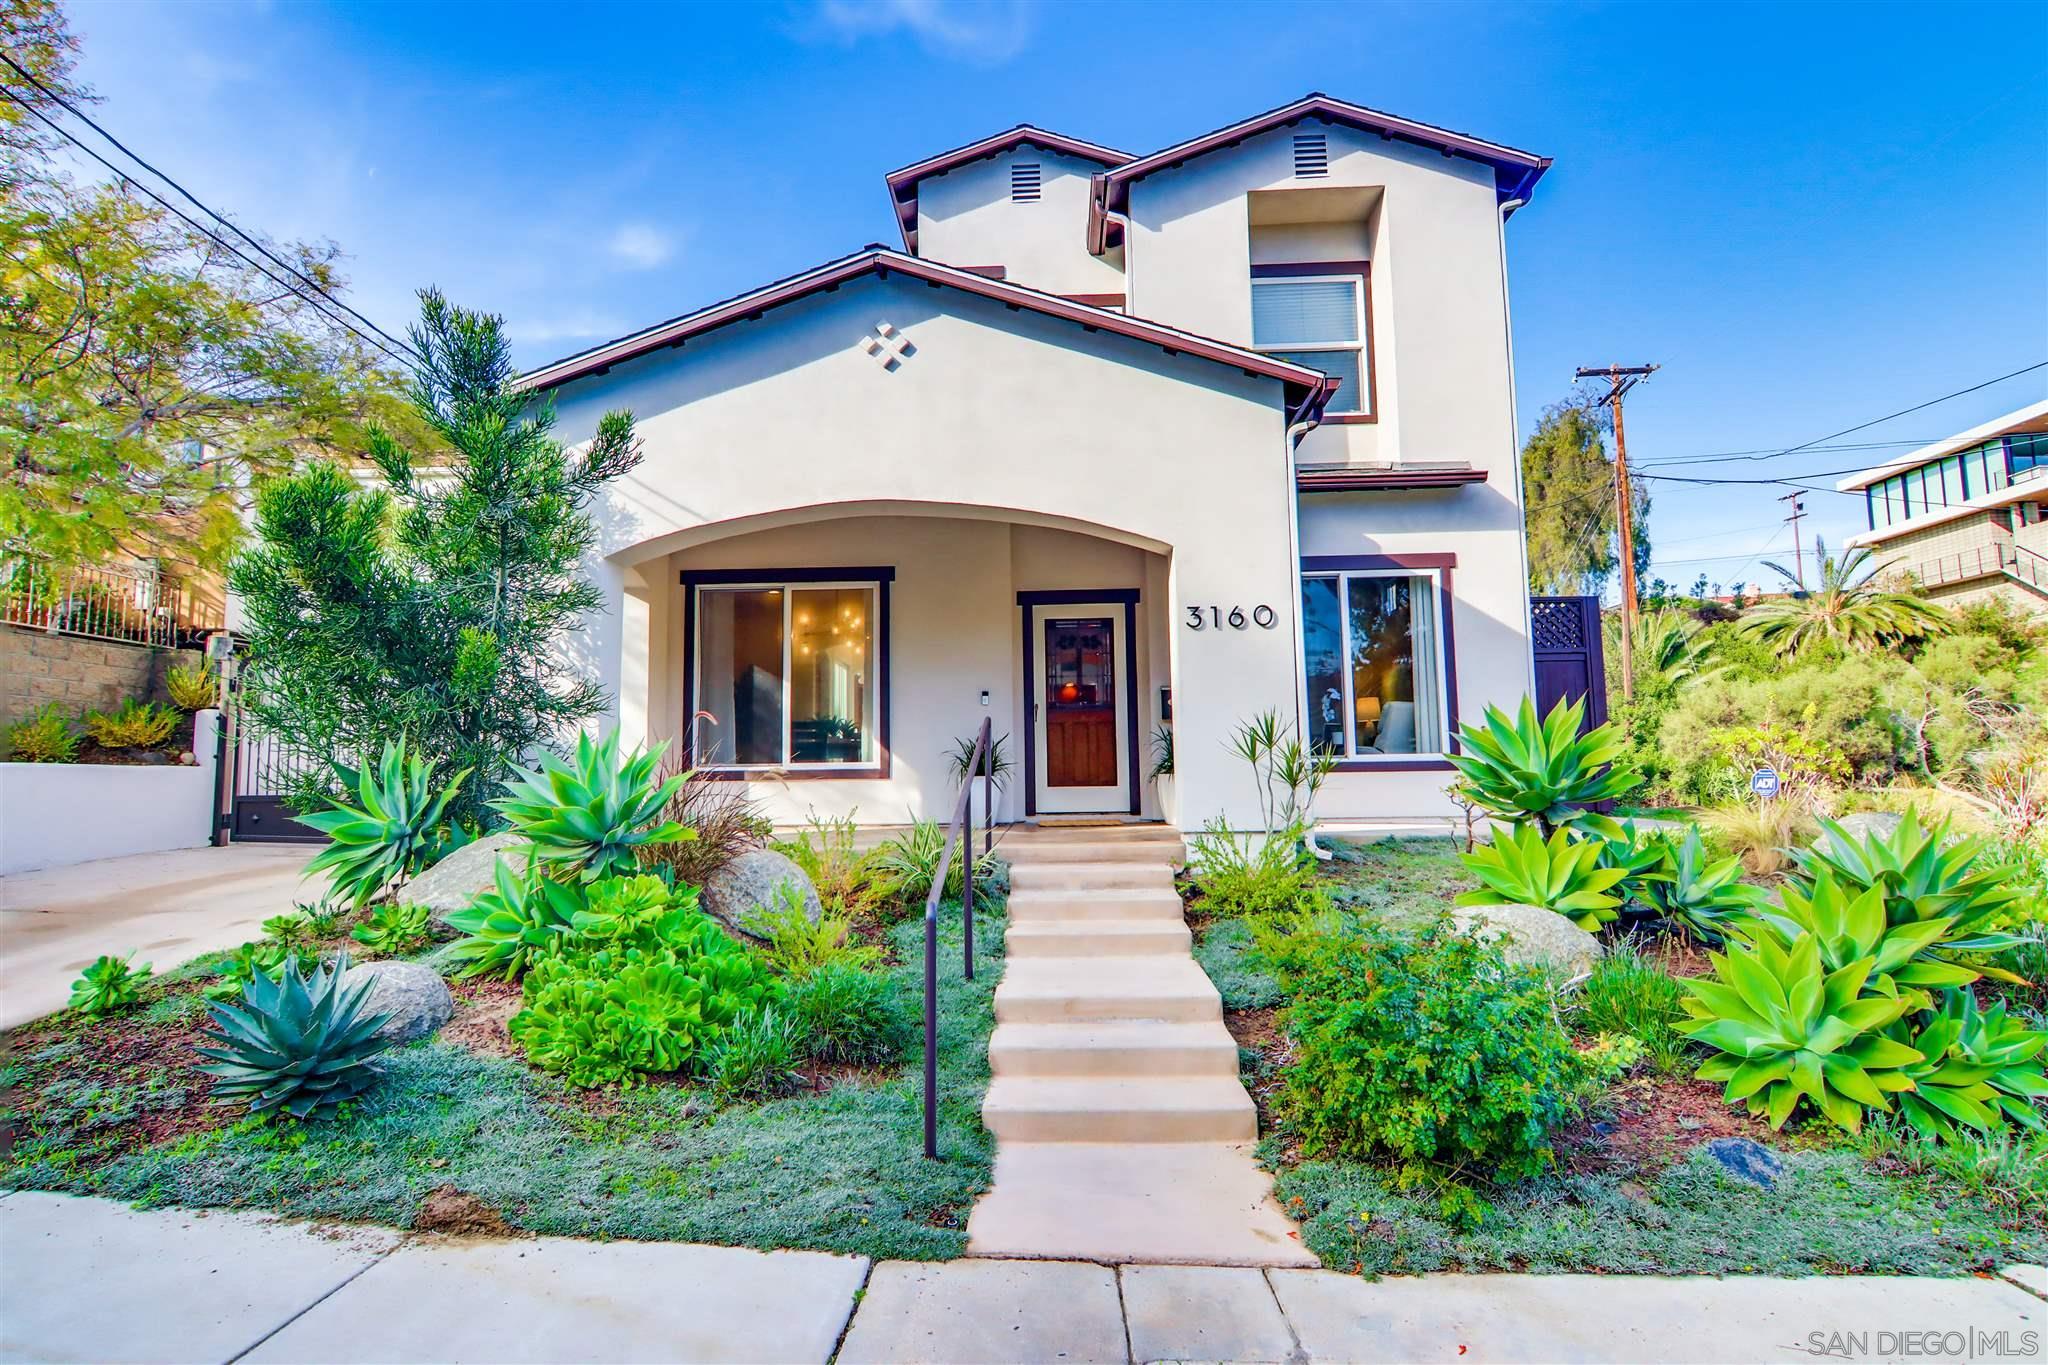 3160 Goldfinch St., San Diego, CA 92103